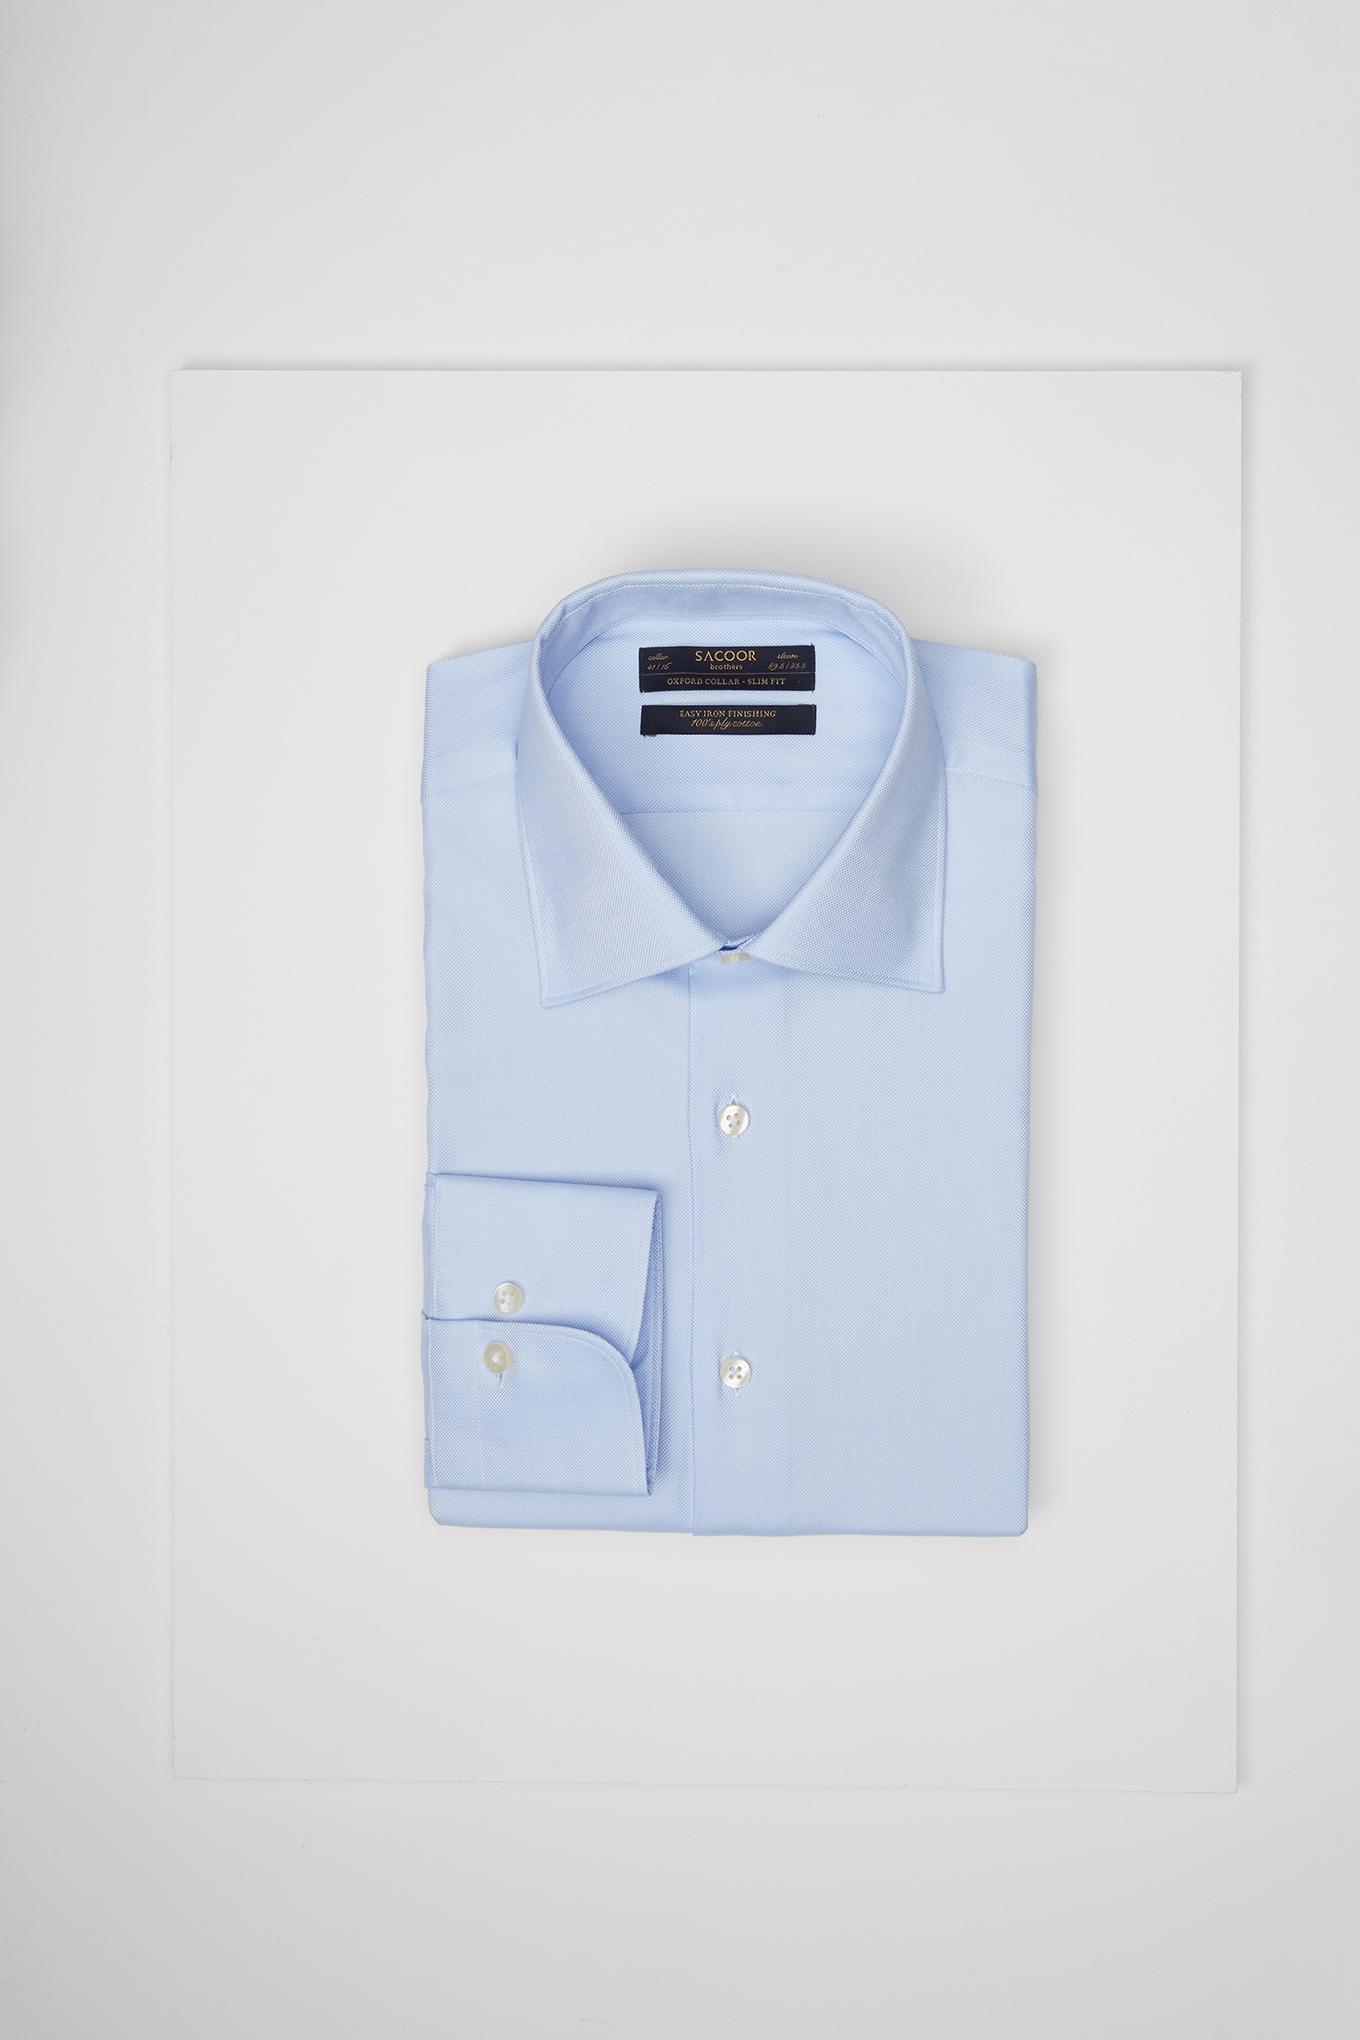 Camisa Azul Claro Classic Homem